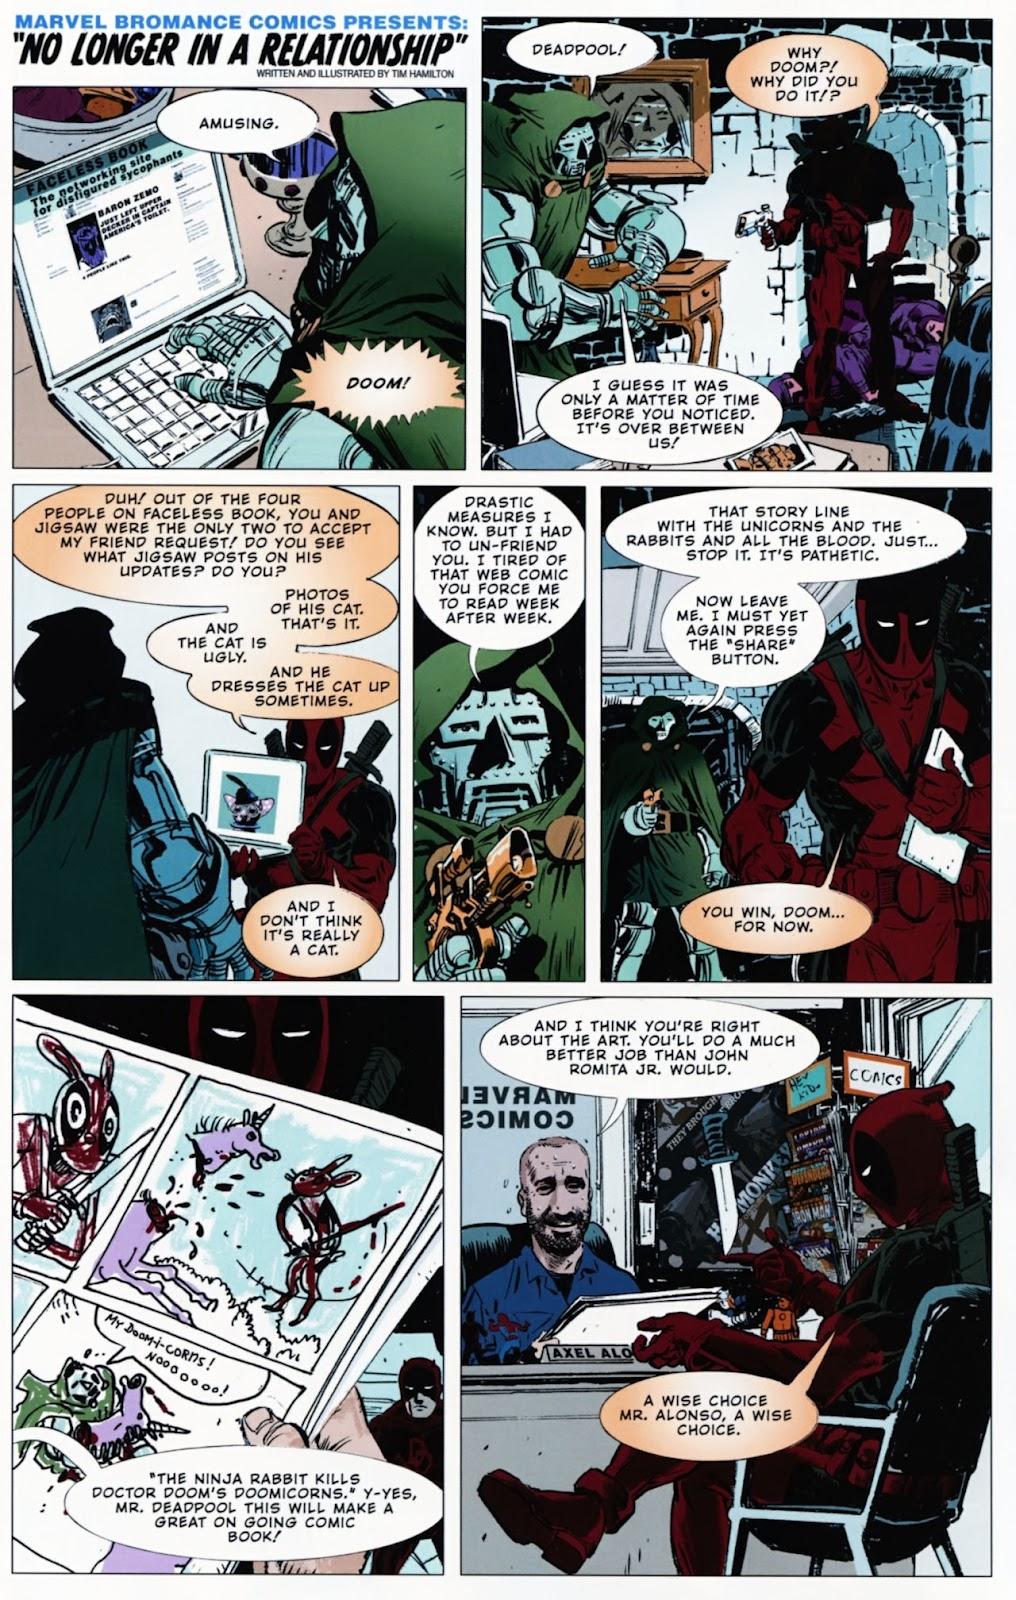 Read online Deadpool (2008) comic -  Issue #1000 - 52